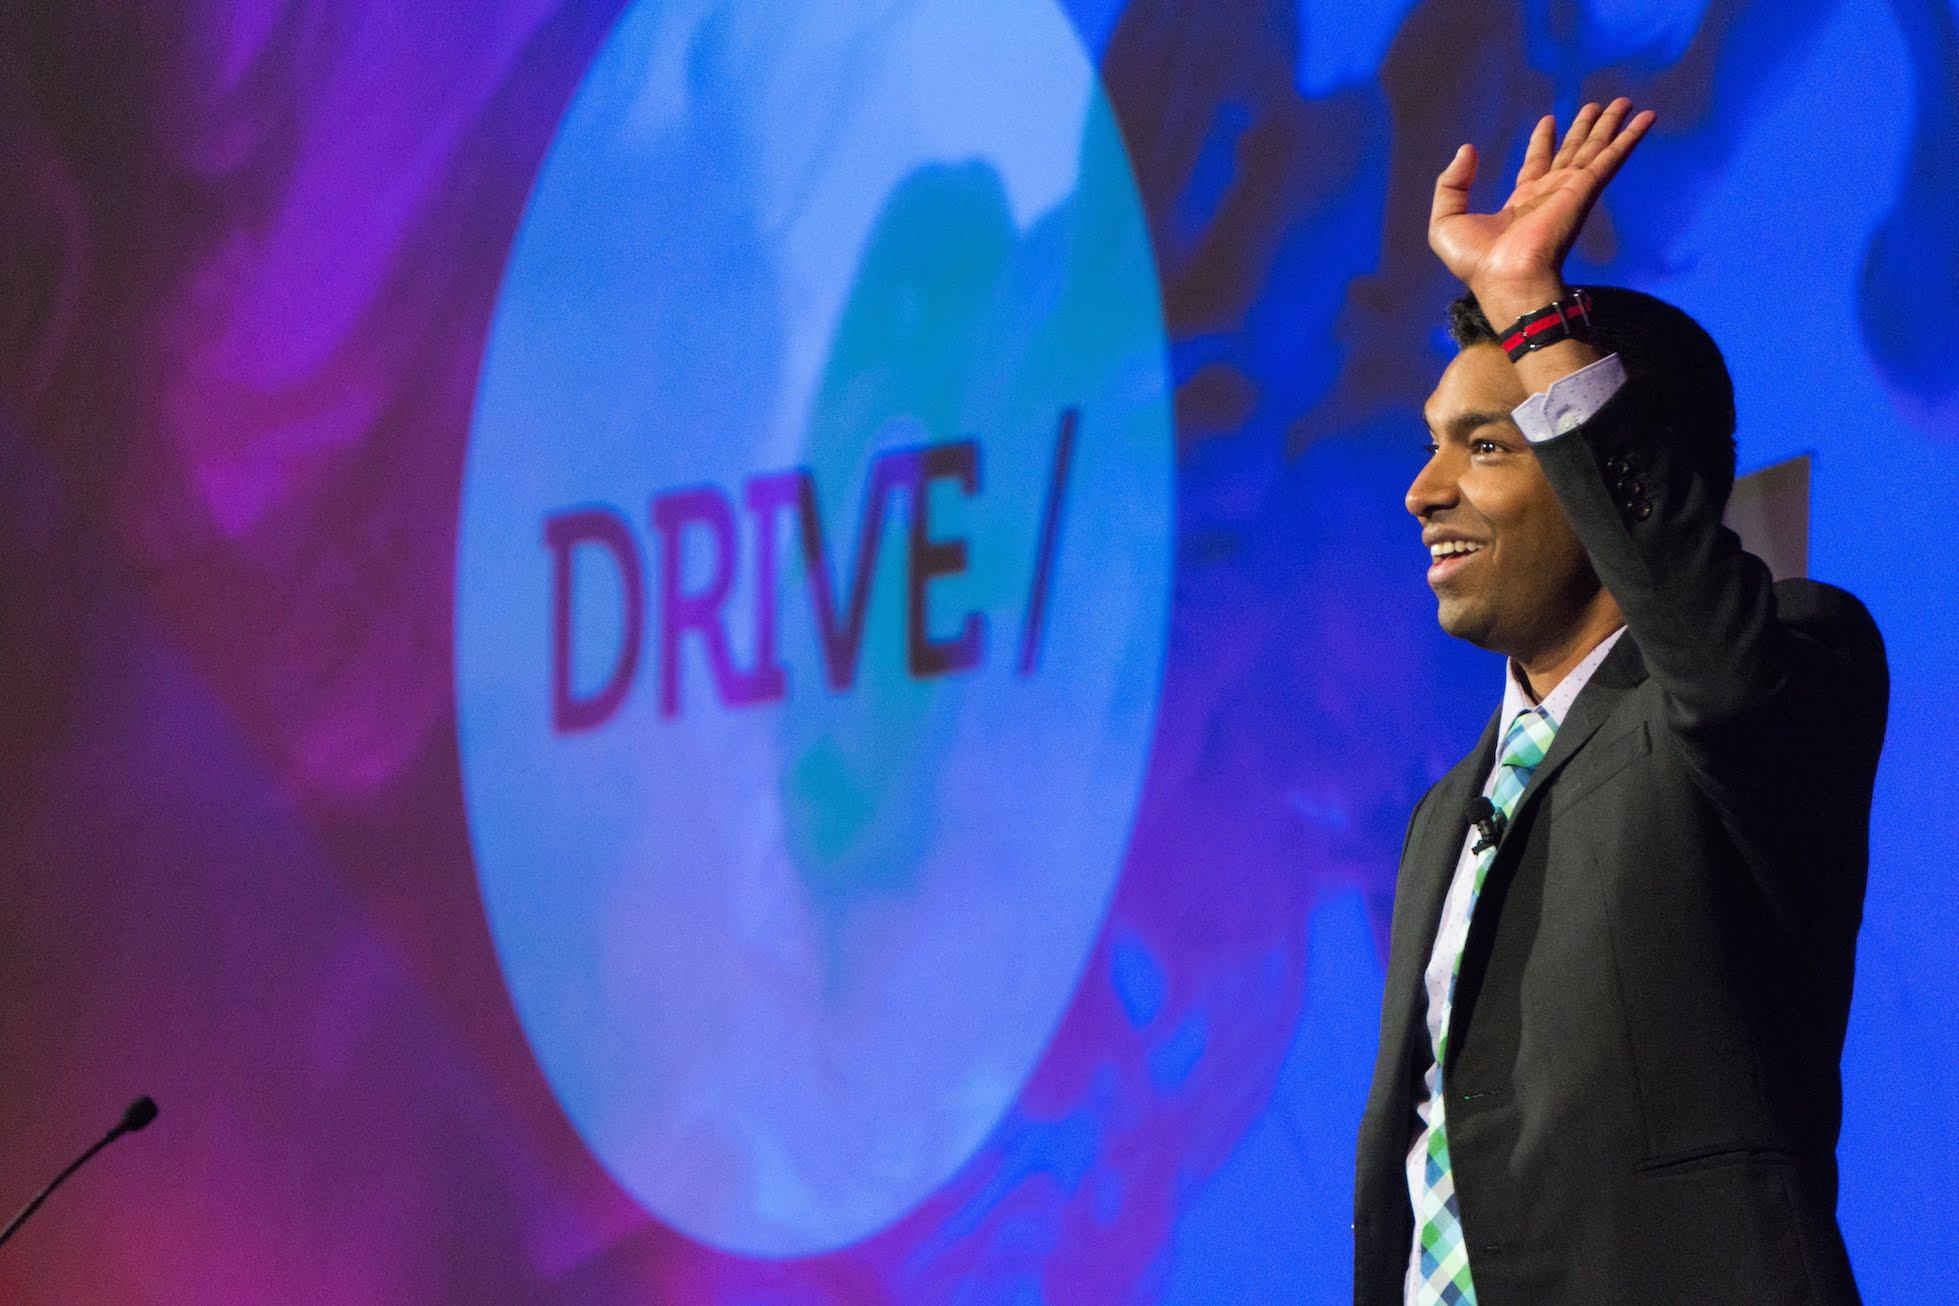 Ashutosh Nandeshwar Data Science Analytics Motivational Speaker